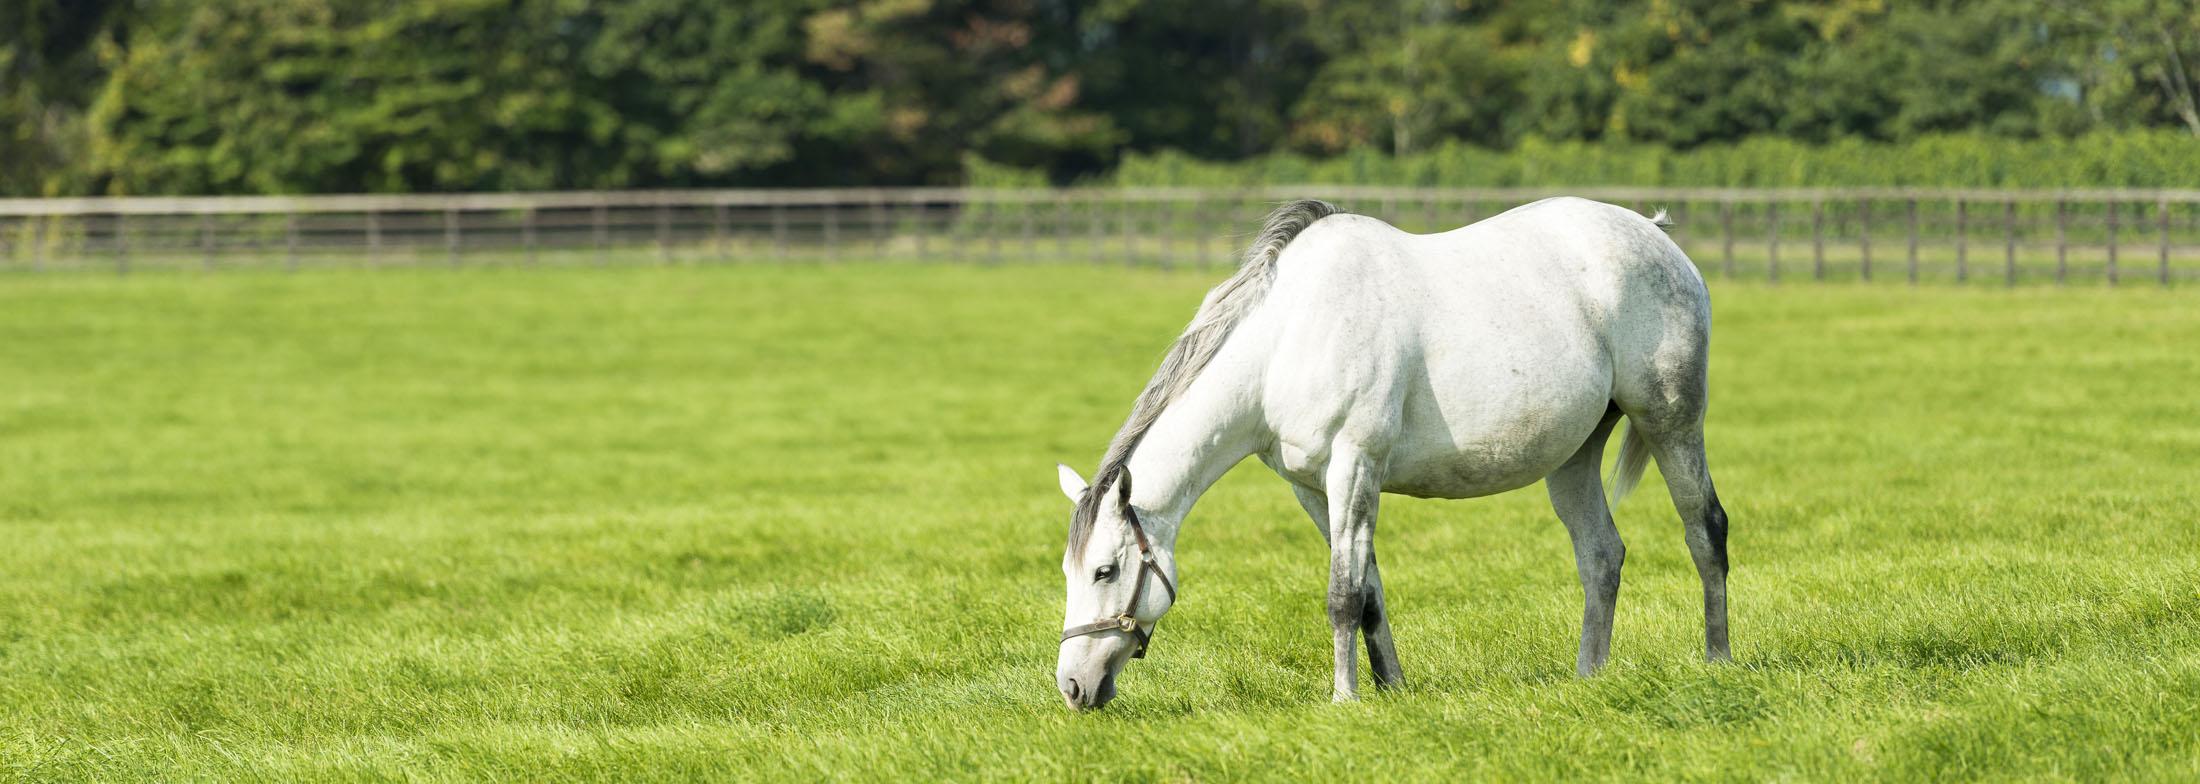 equineslider7